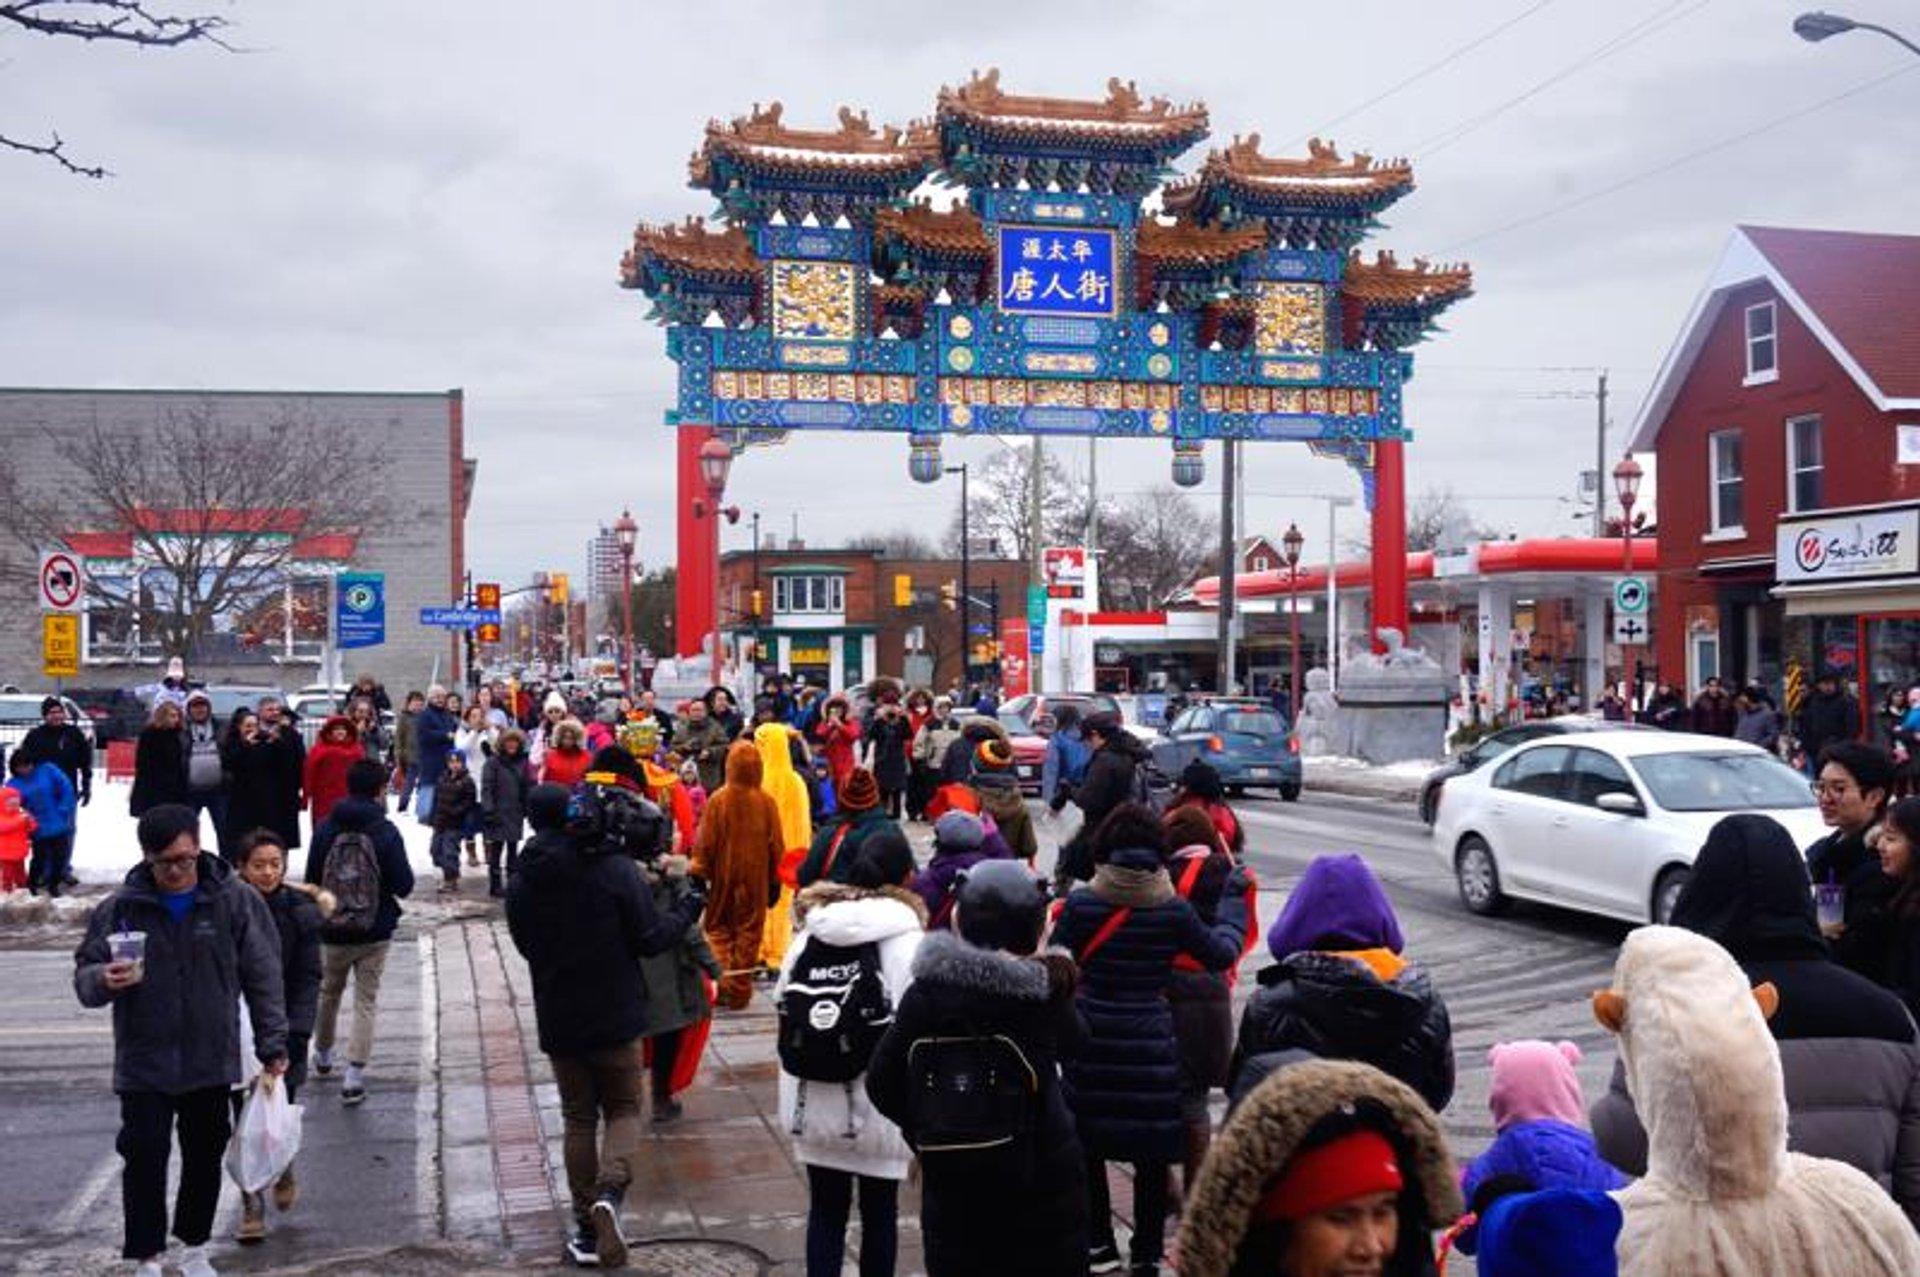 Lunar New Year Celebration in Ottawa 2019 - Best Time